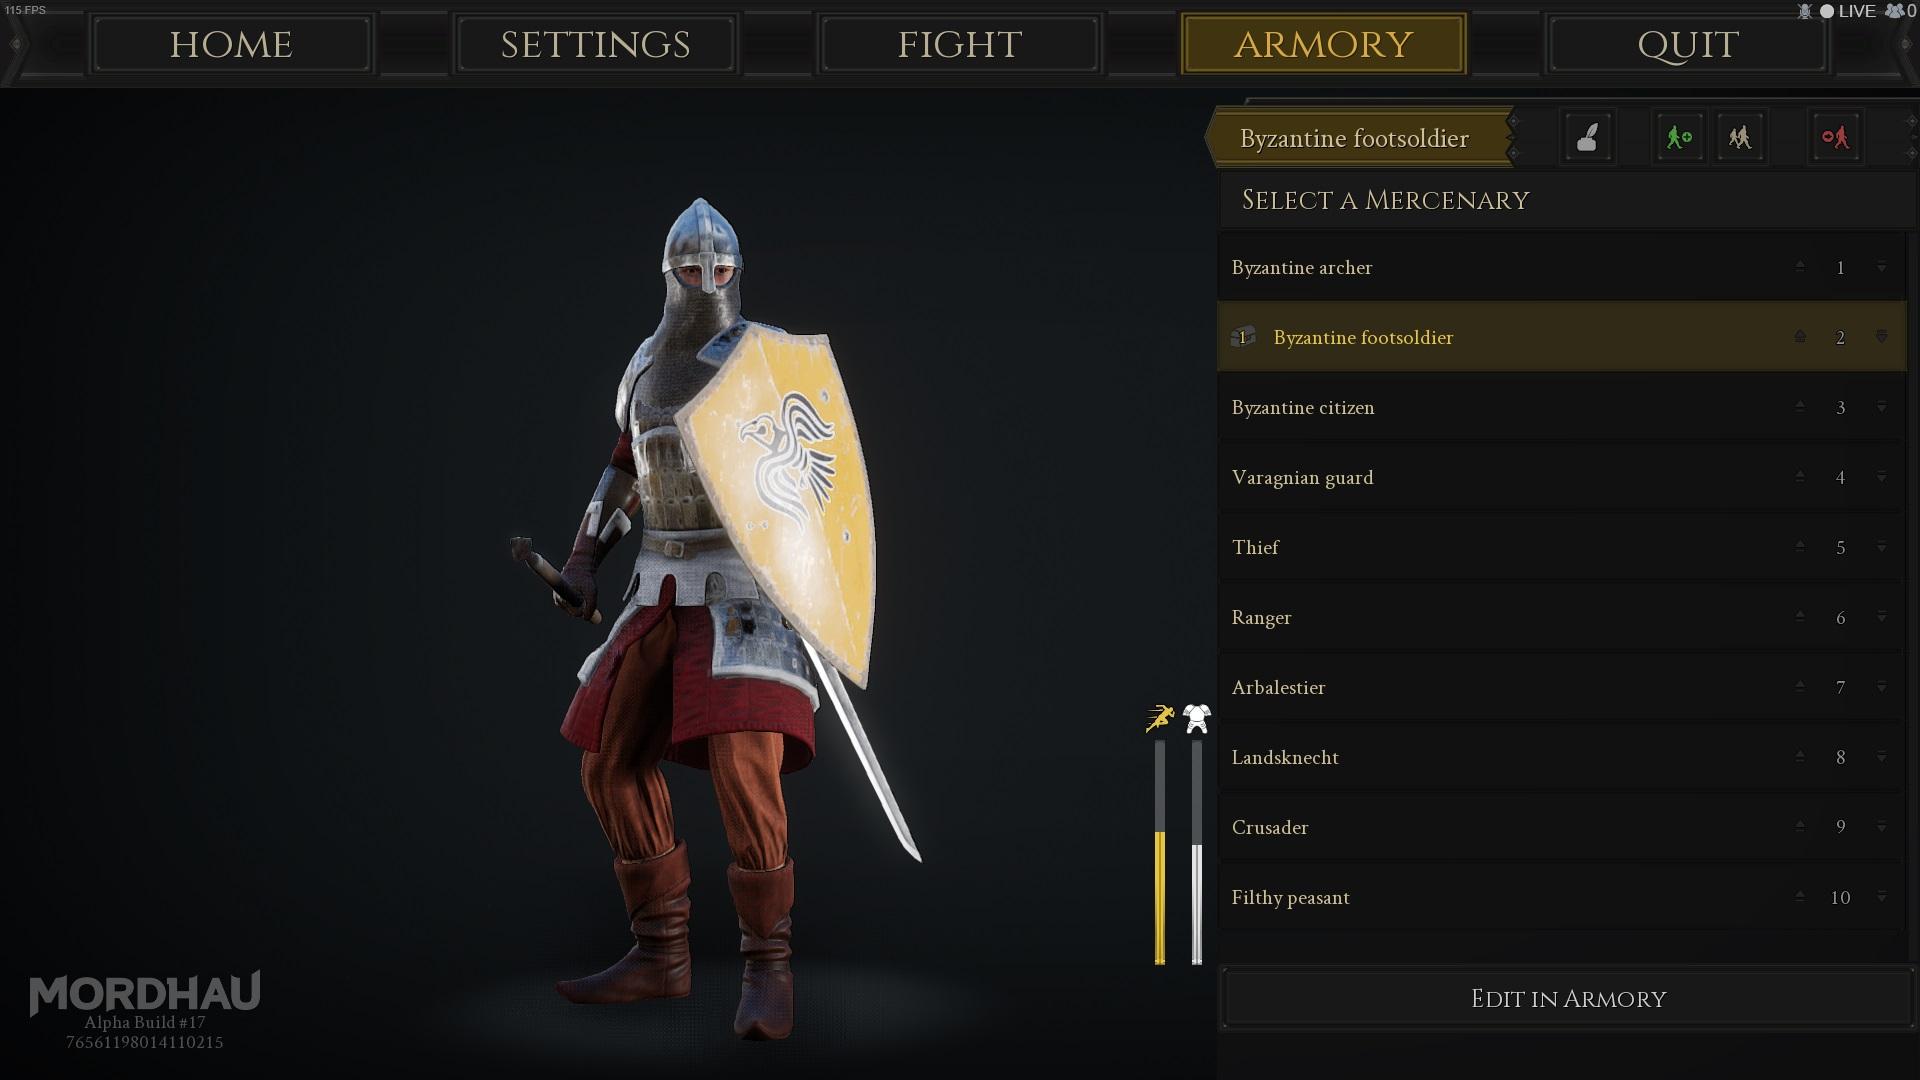 Varagnian guard.jpg